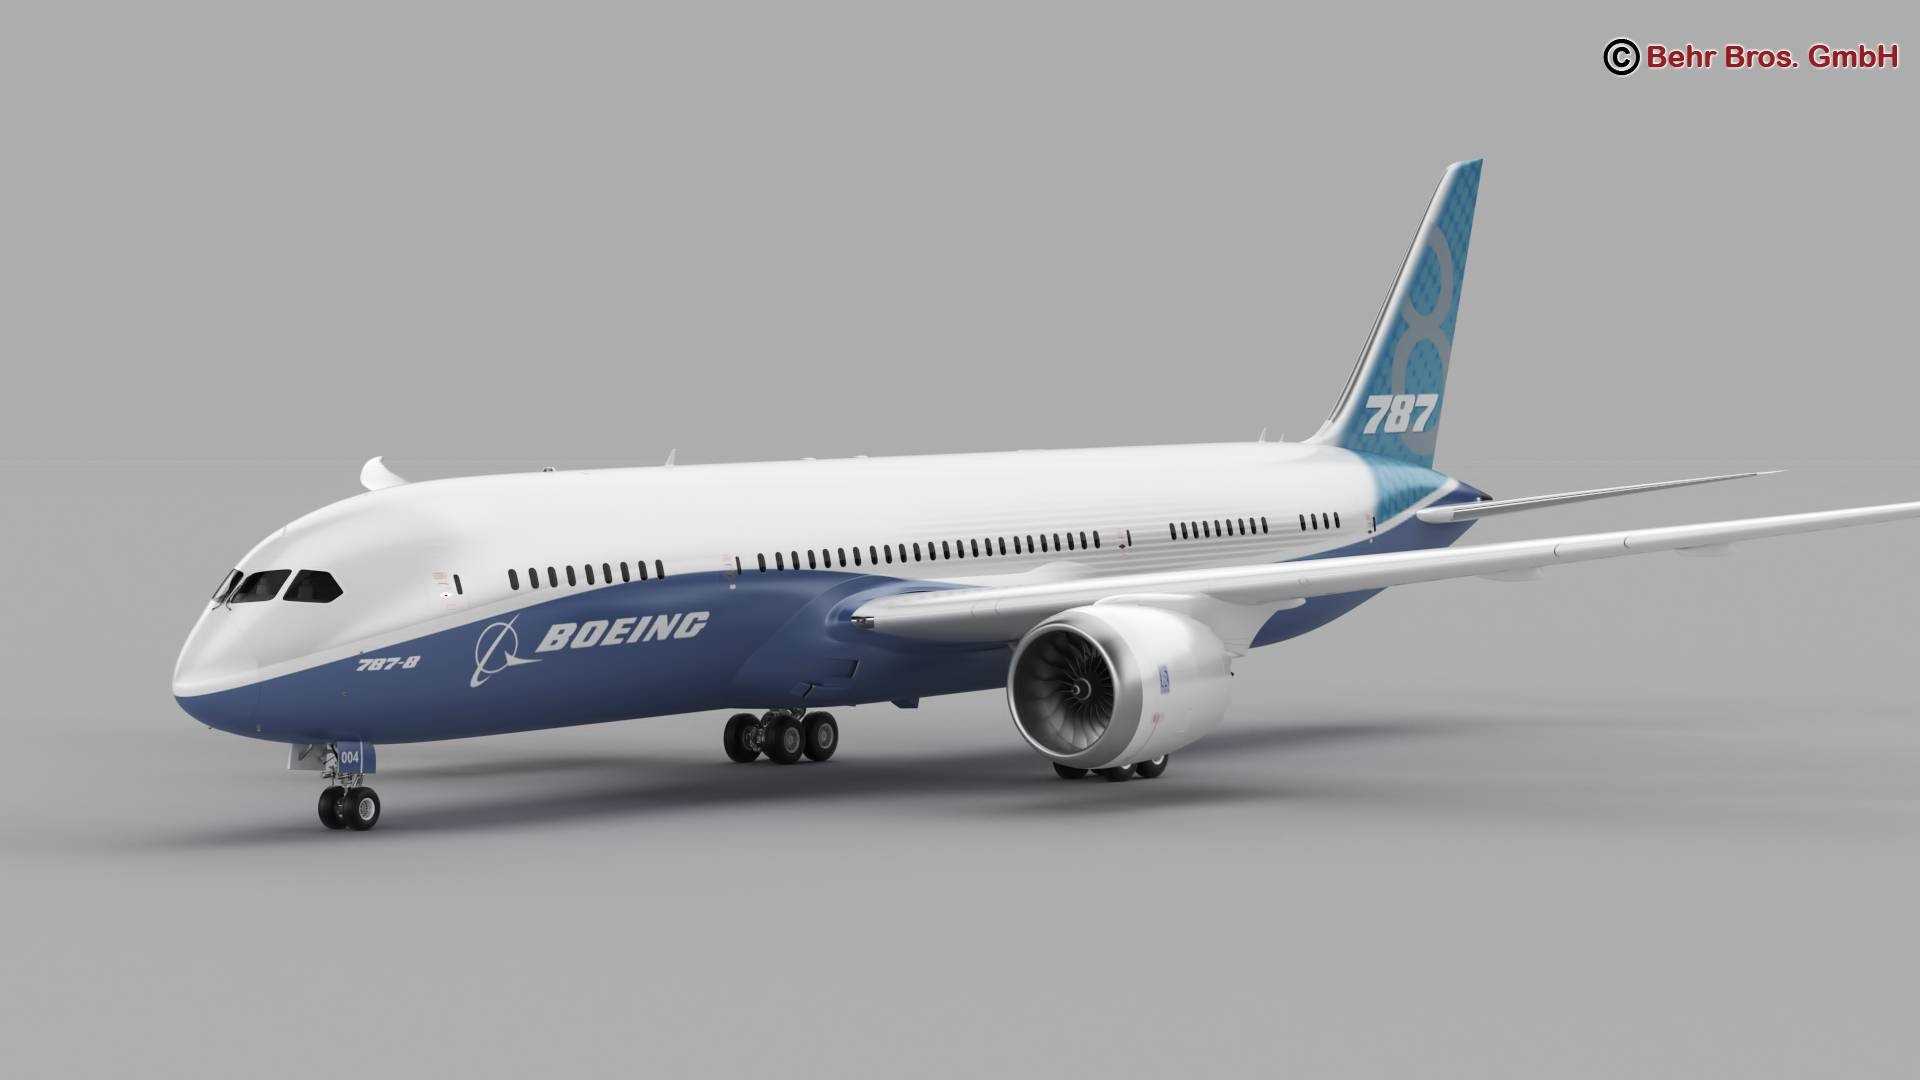 Boeing 787-8 3d gerð 3ds max fbx c4d lwo ma mb obj 251356